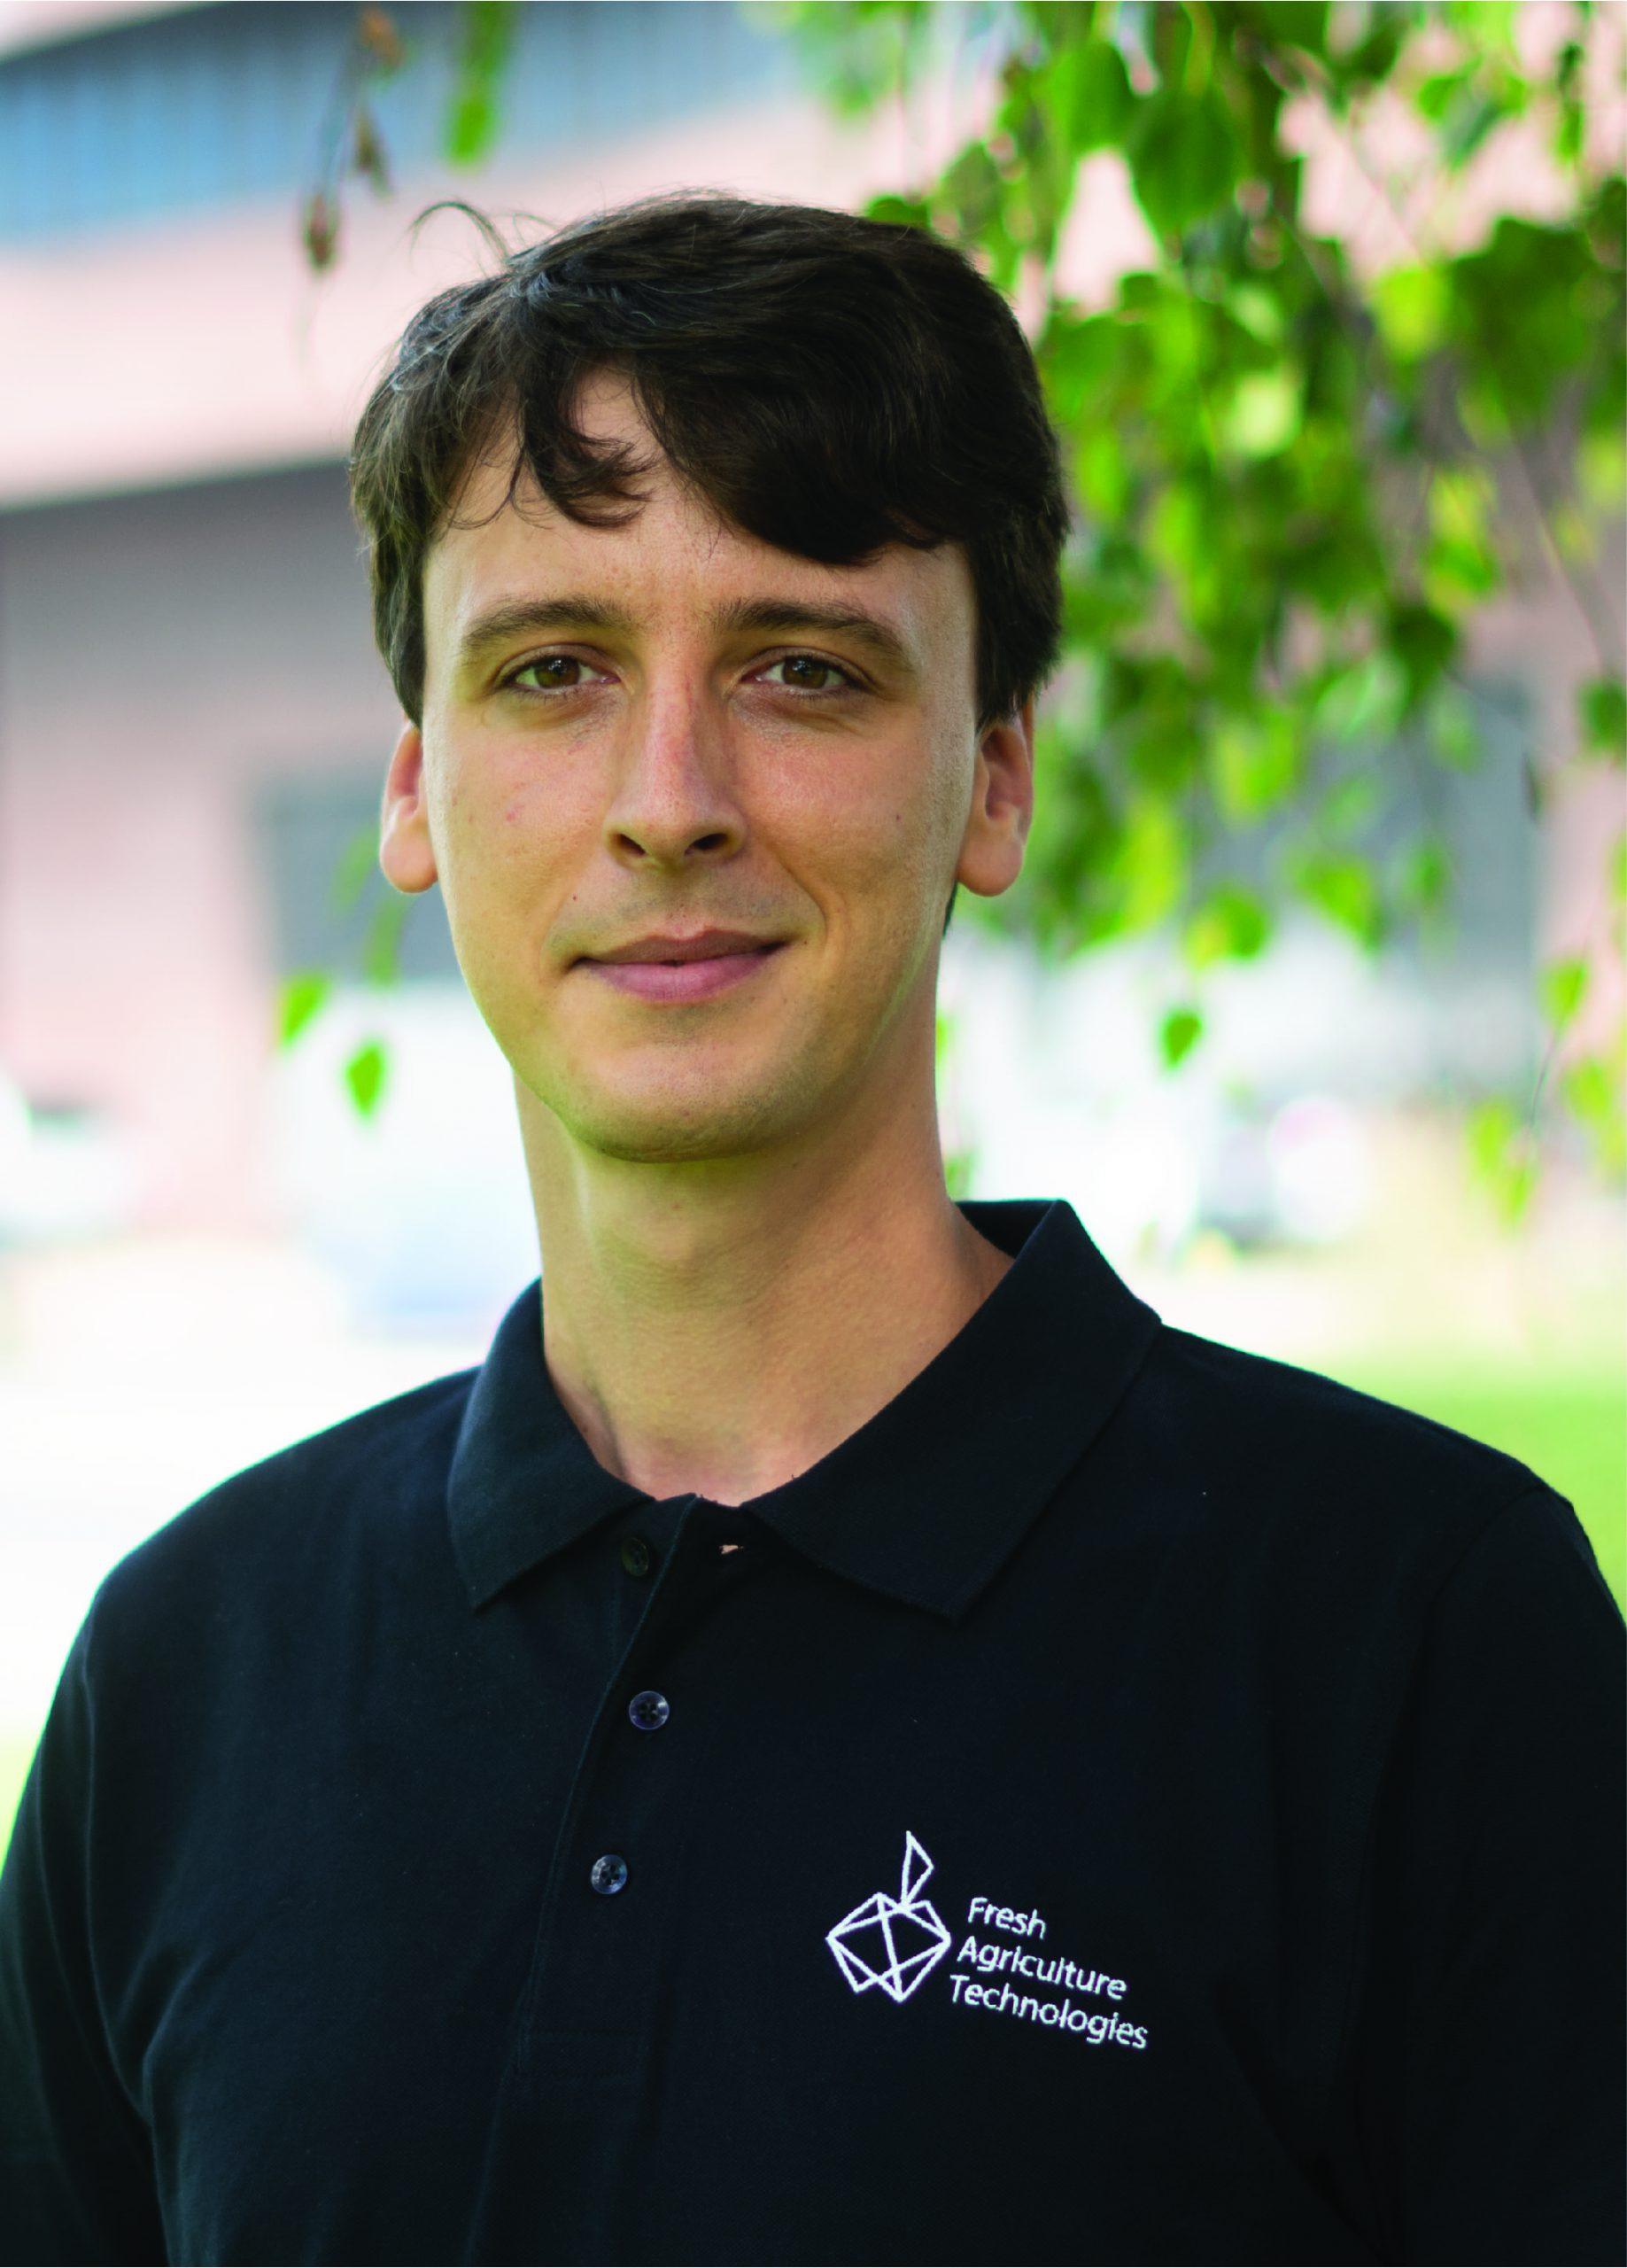 Stefan Manja, Chief Science Officer